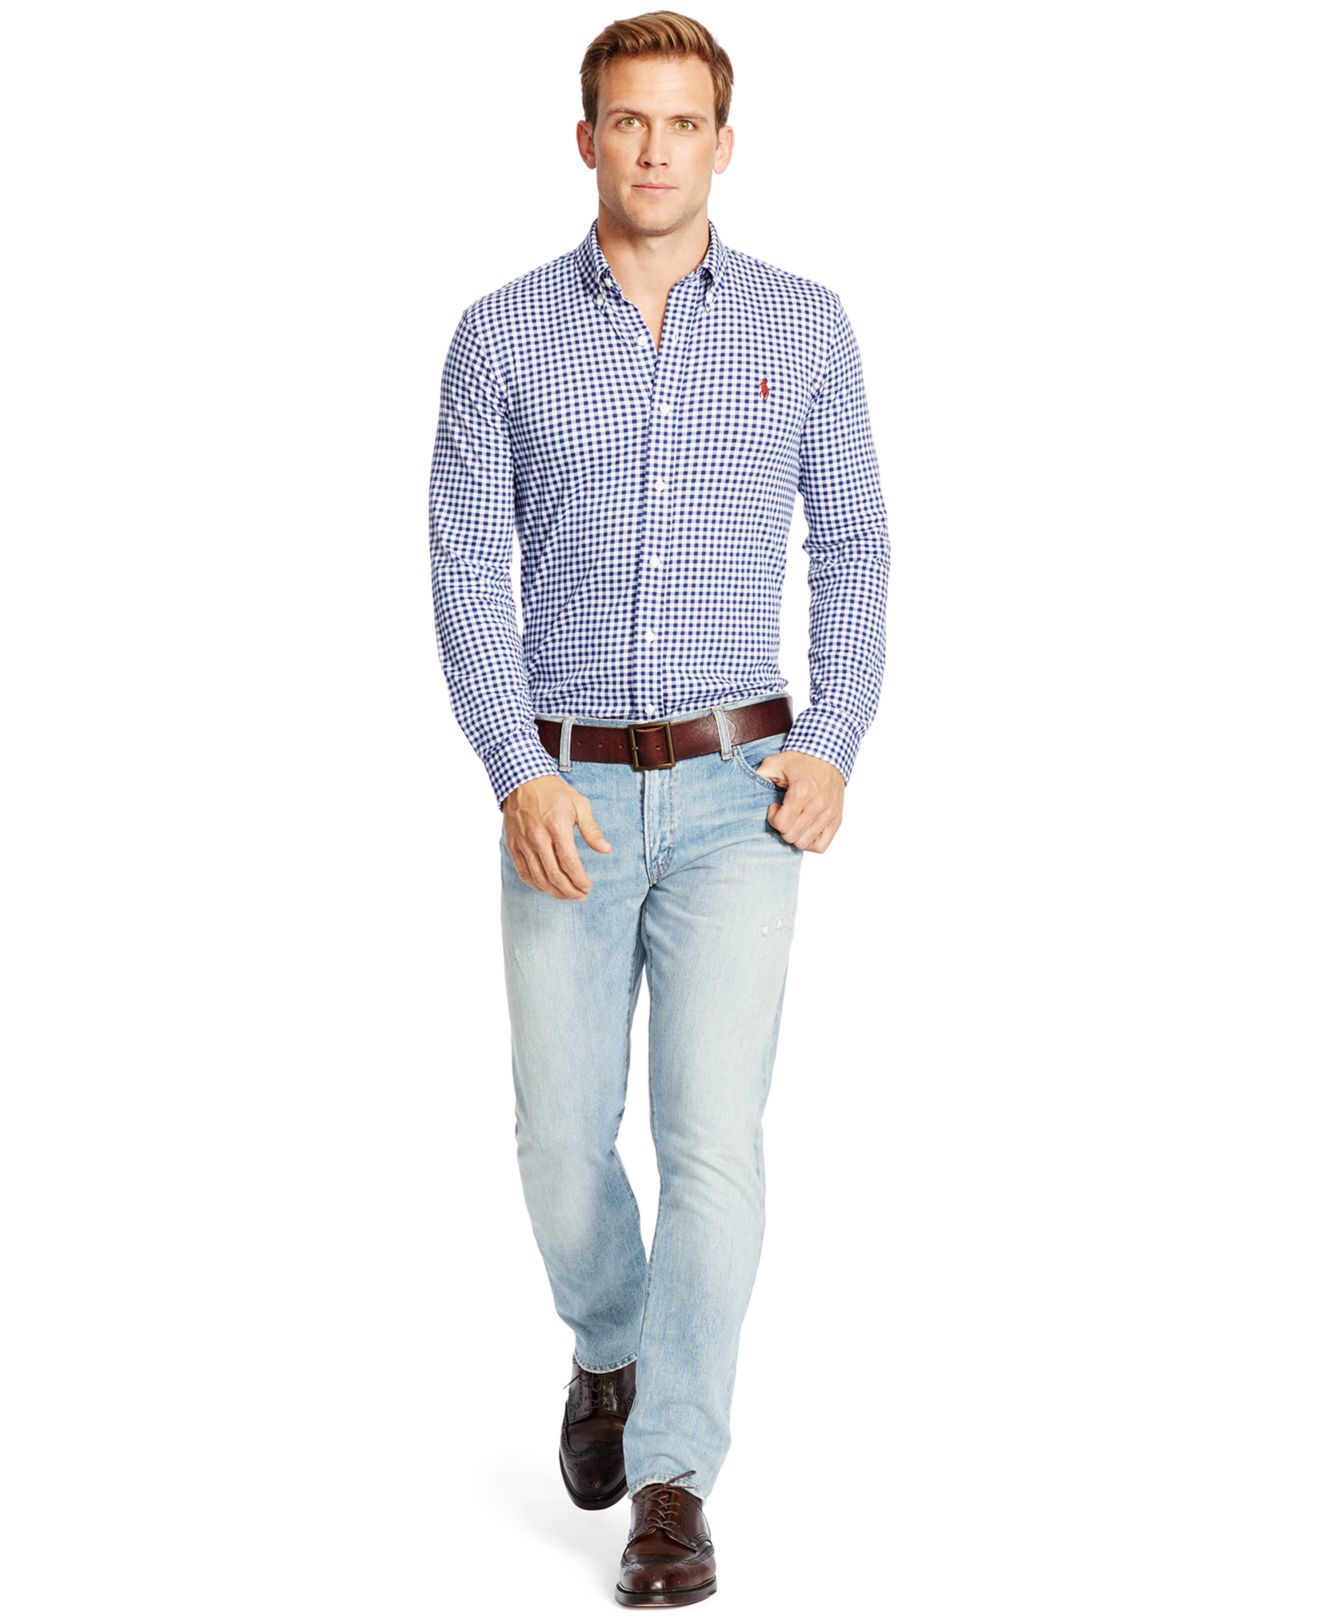 Lyst Polo Ralph Lauren Gingham Knit Dress Shirt In Blue For Men